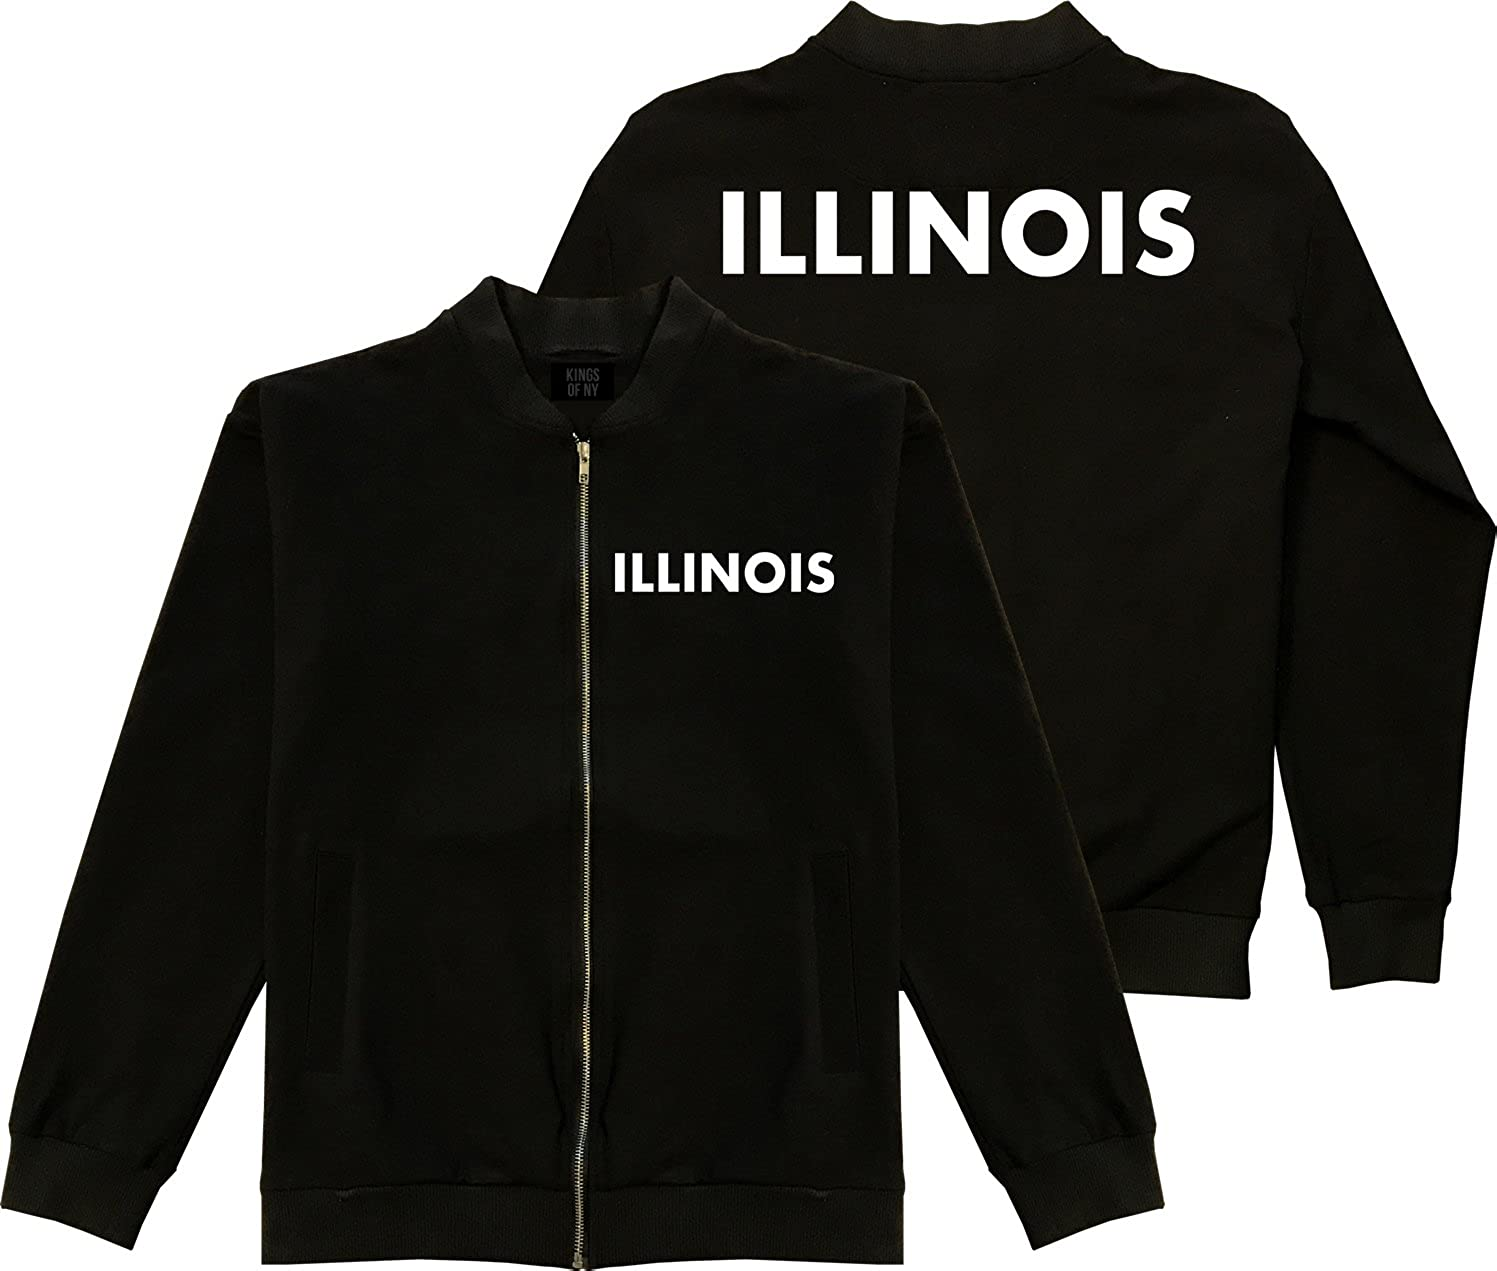 Kings Of NY Illinois State 2 Sided Black Cotton Bomber Jacket